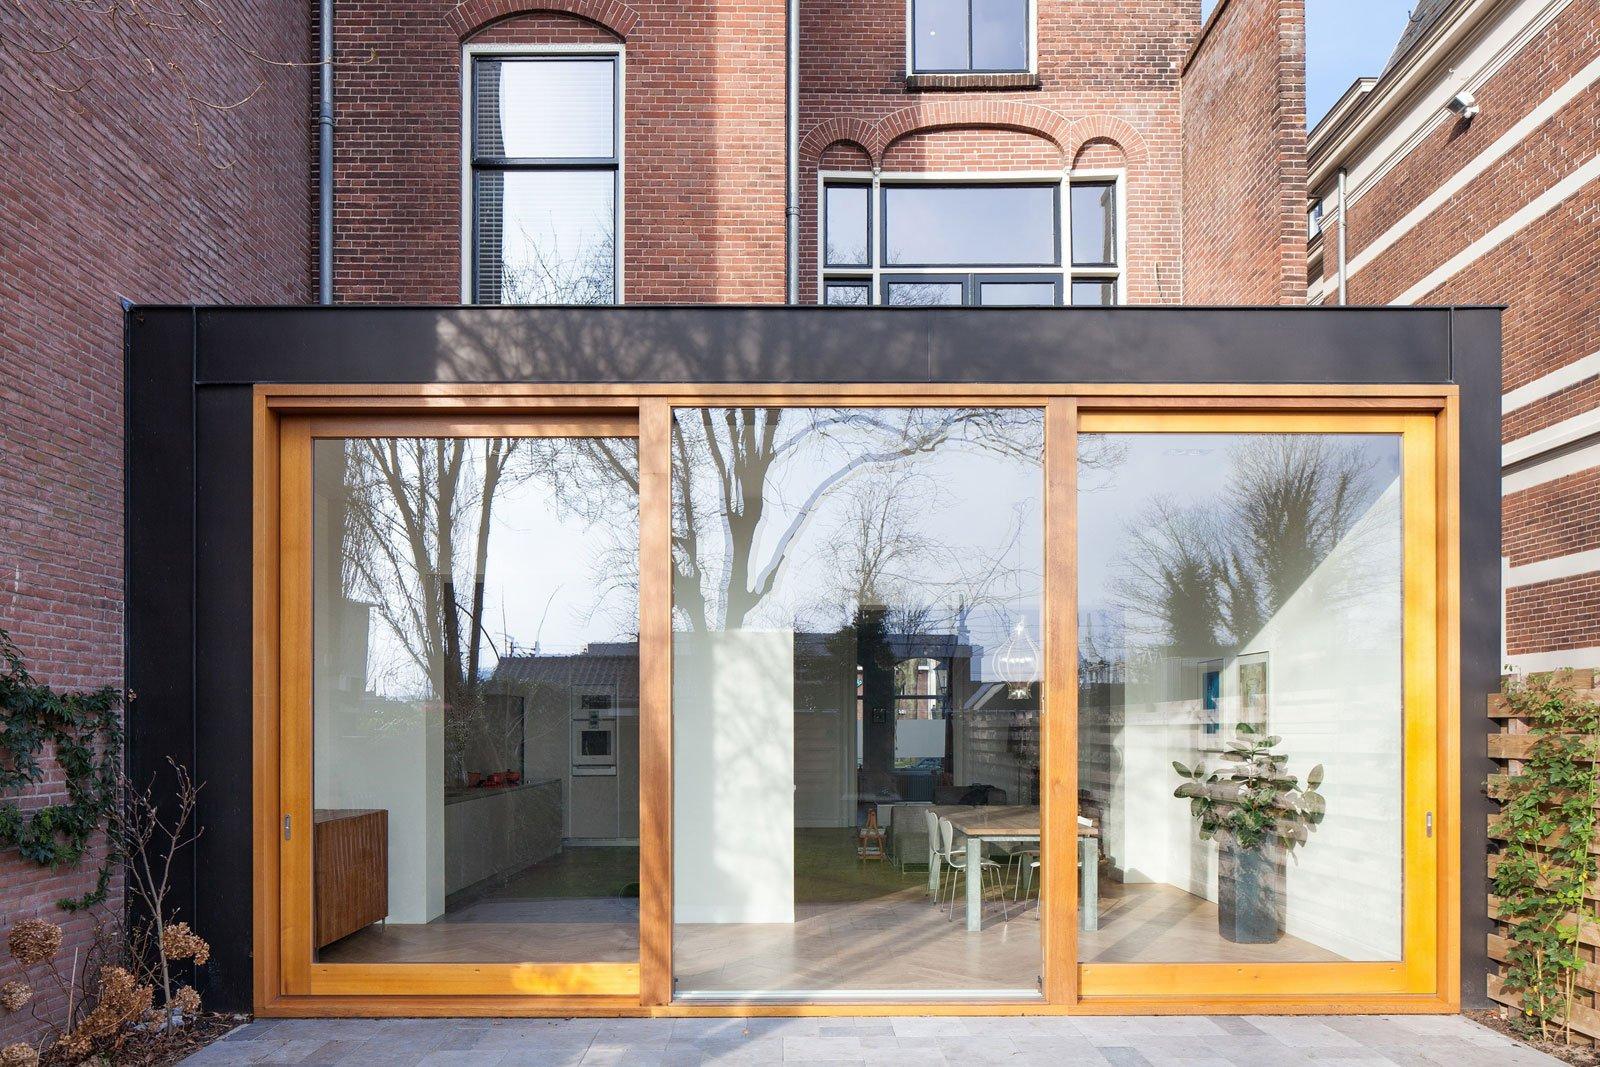 Extension-Maliebaan-Utrecht-02